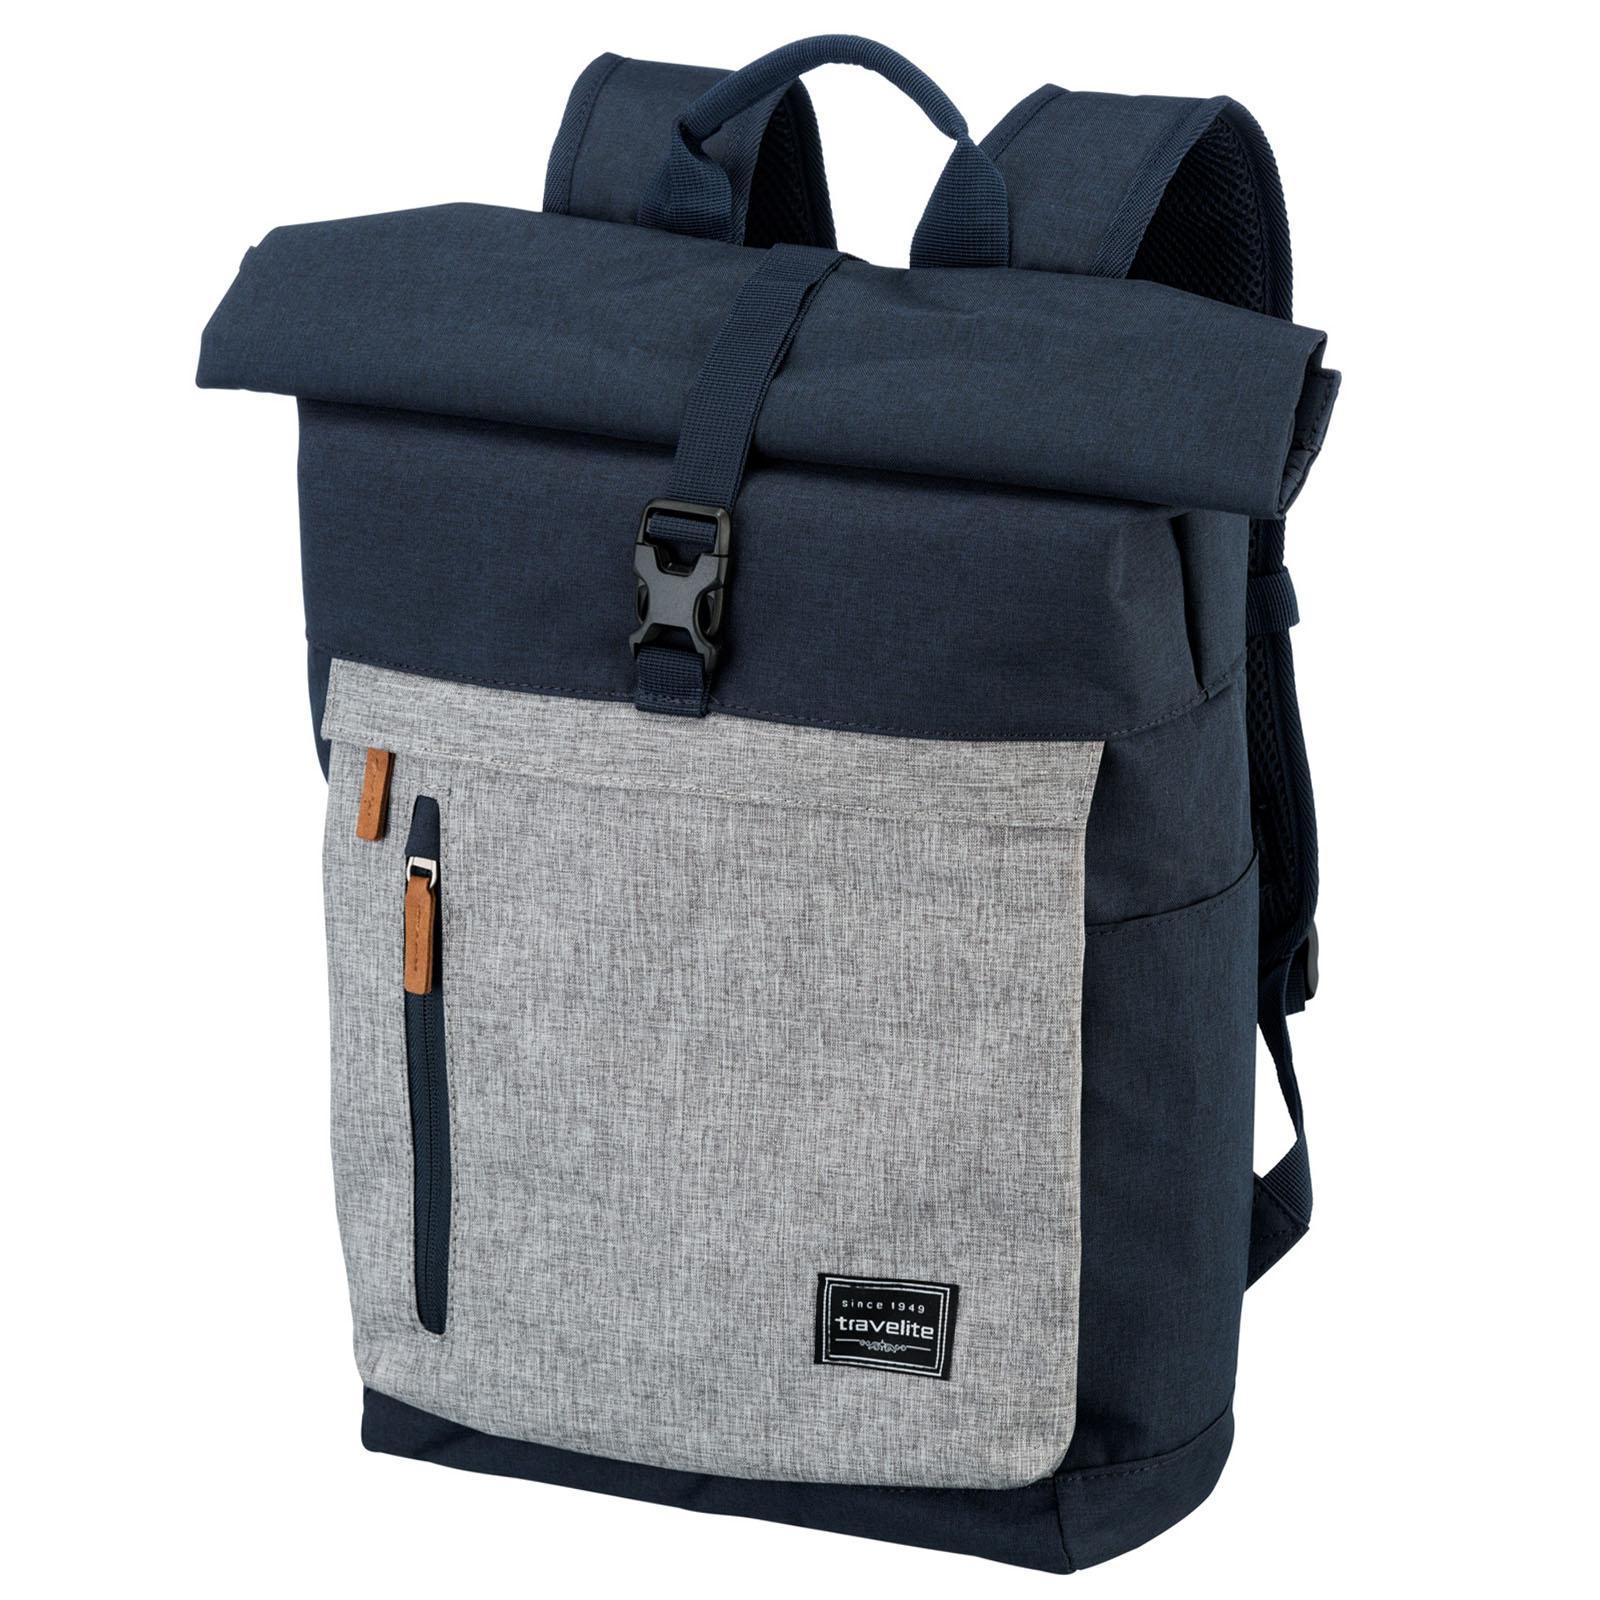 travelite-basics-rollup-rucksack